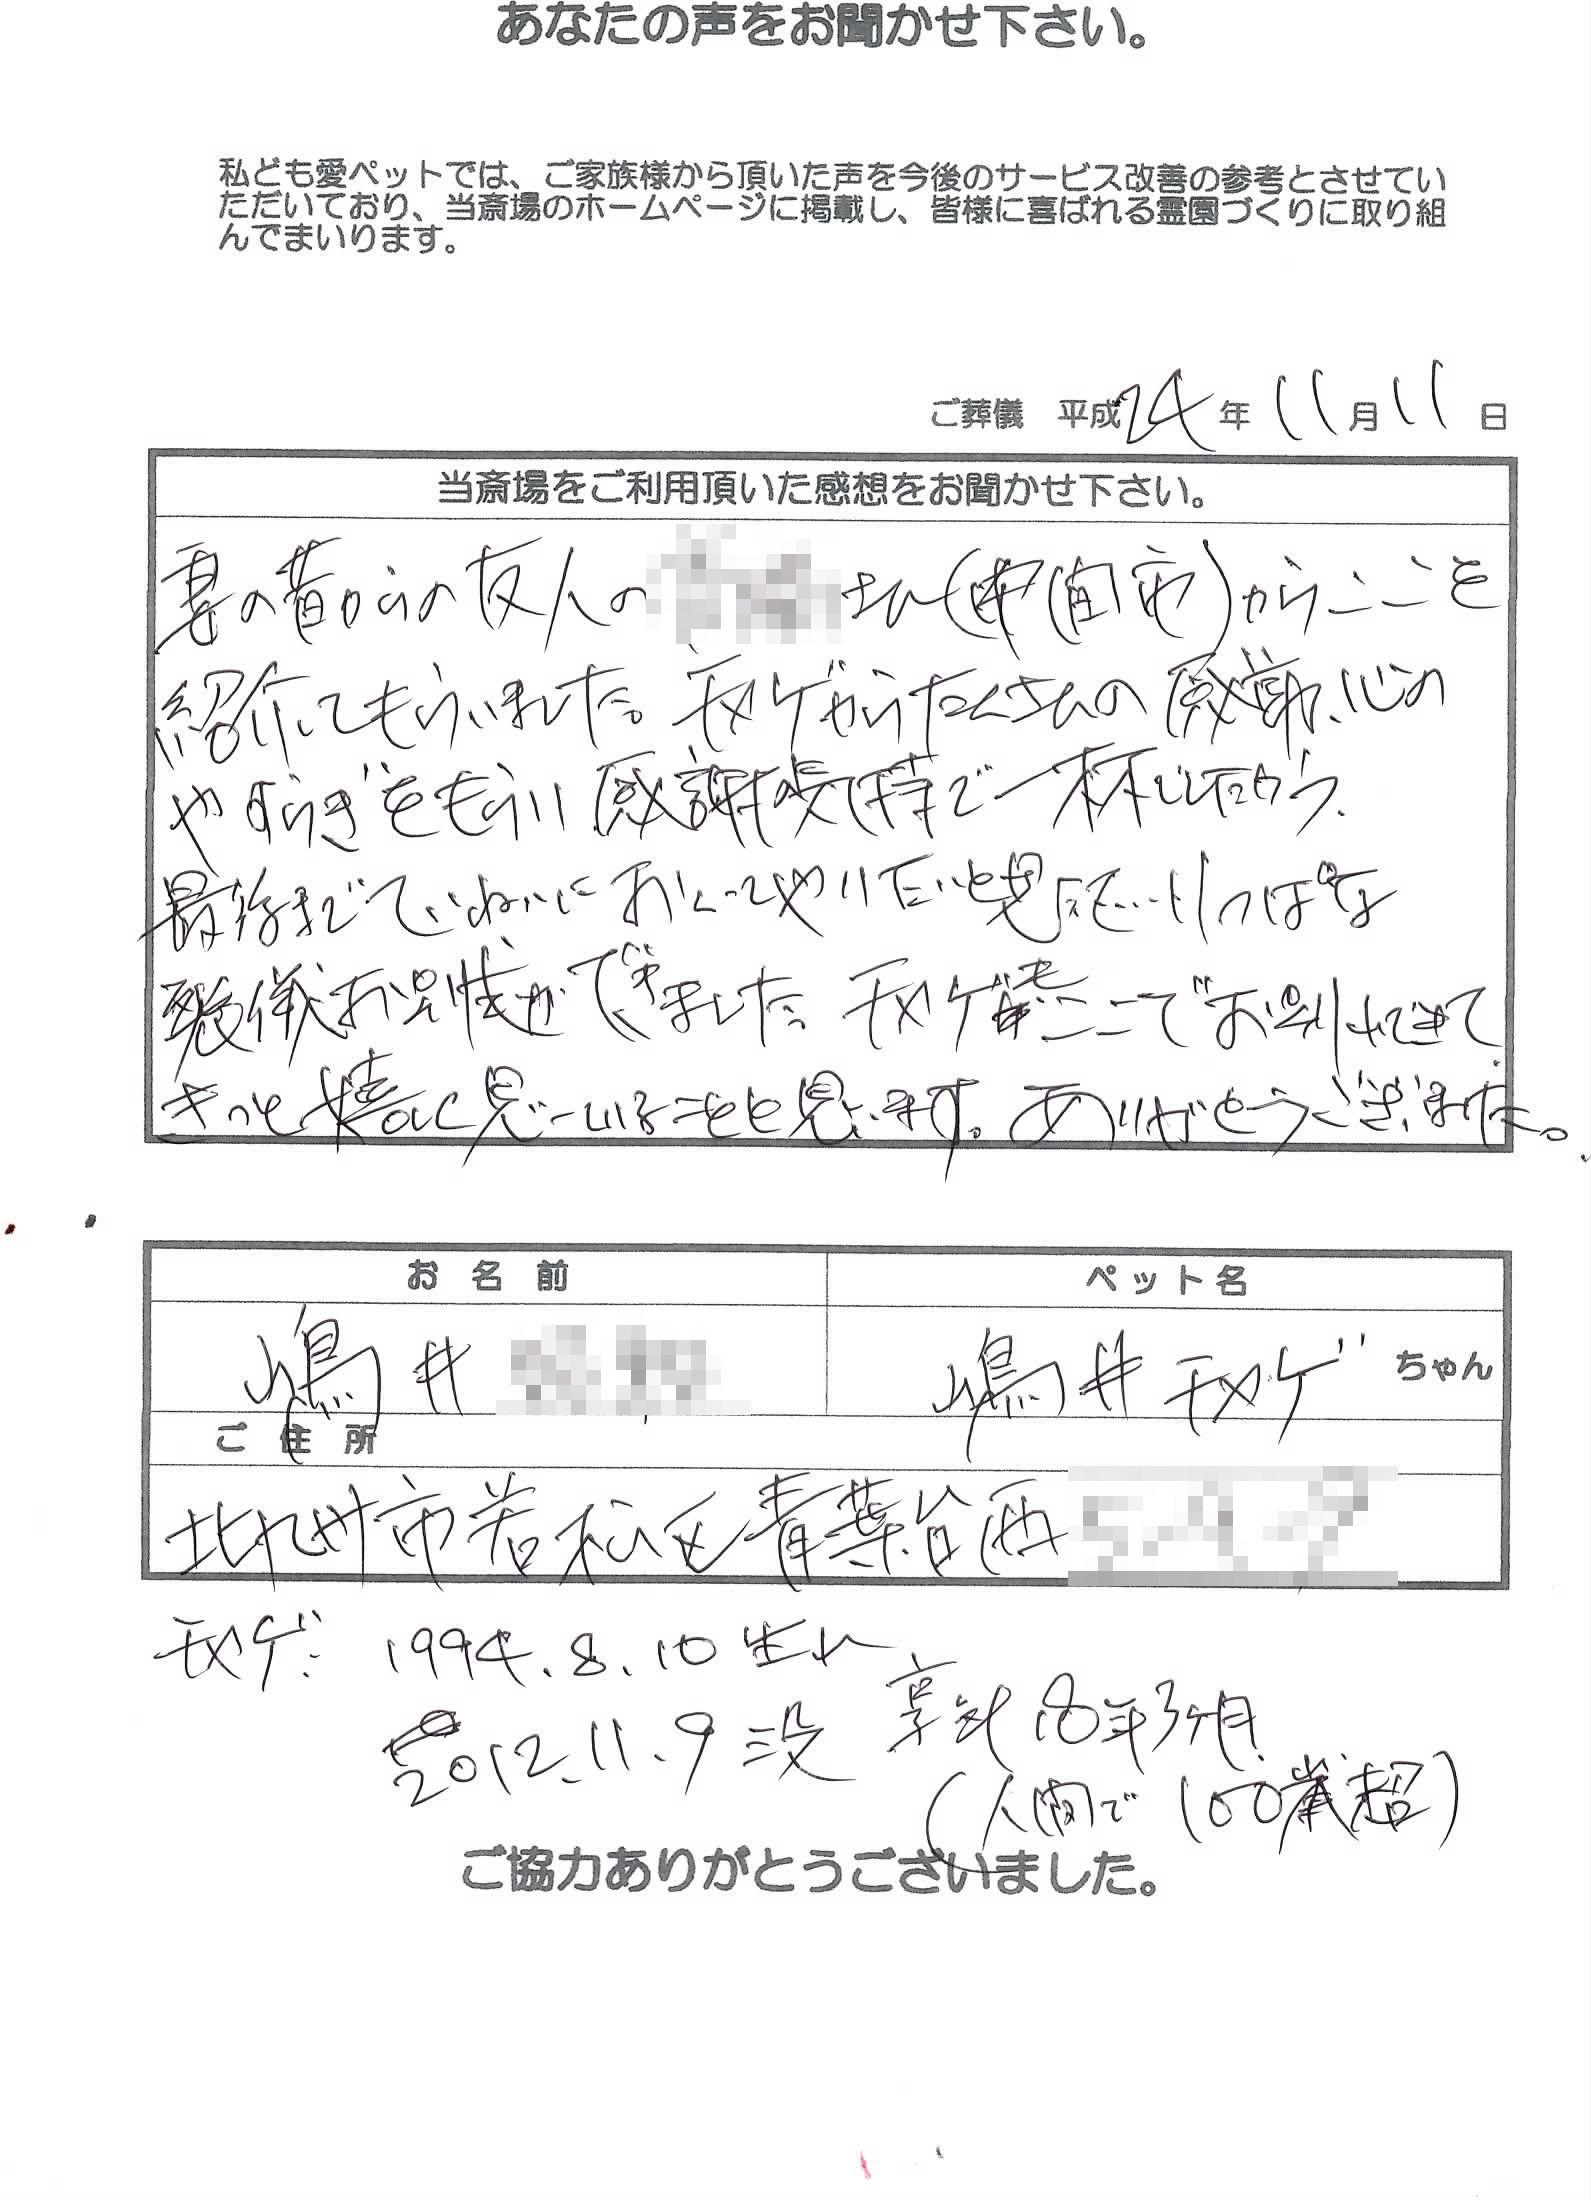 k121111-2.jpg